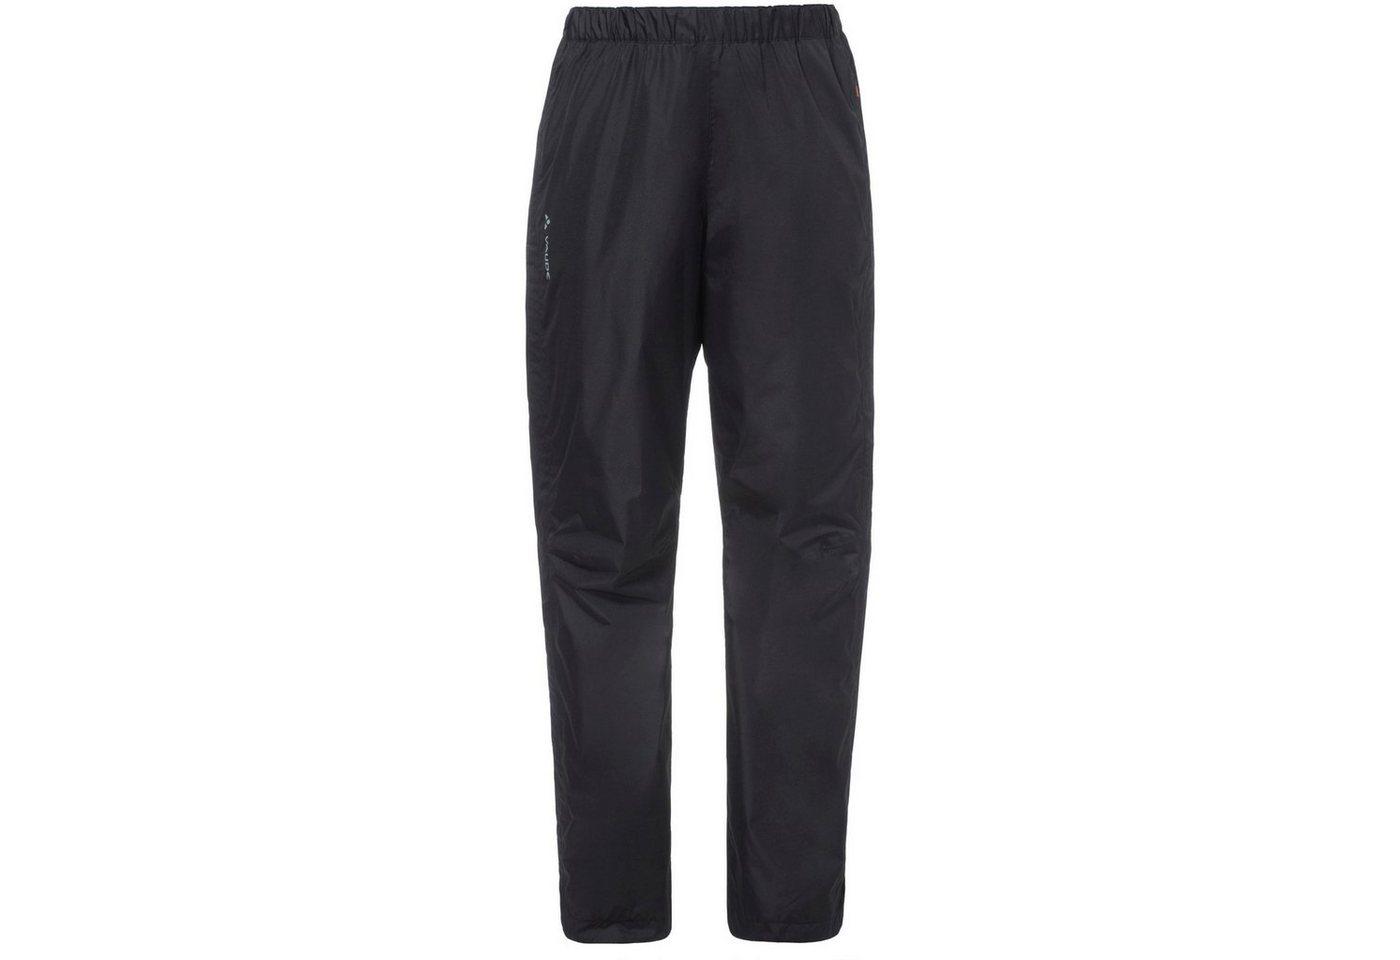 VAUDE Regenhose »Fluid Full-Zip« | Sportbekleidung > Sporthosen > Regenhosen | Schwarz | Polyester - Polyamid - Polyurethan | VAUDE